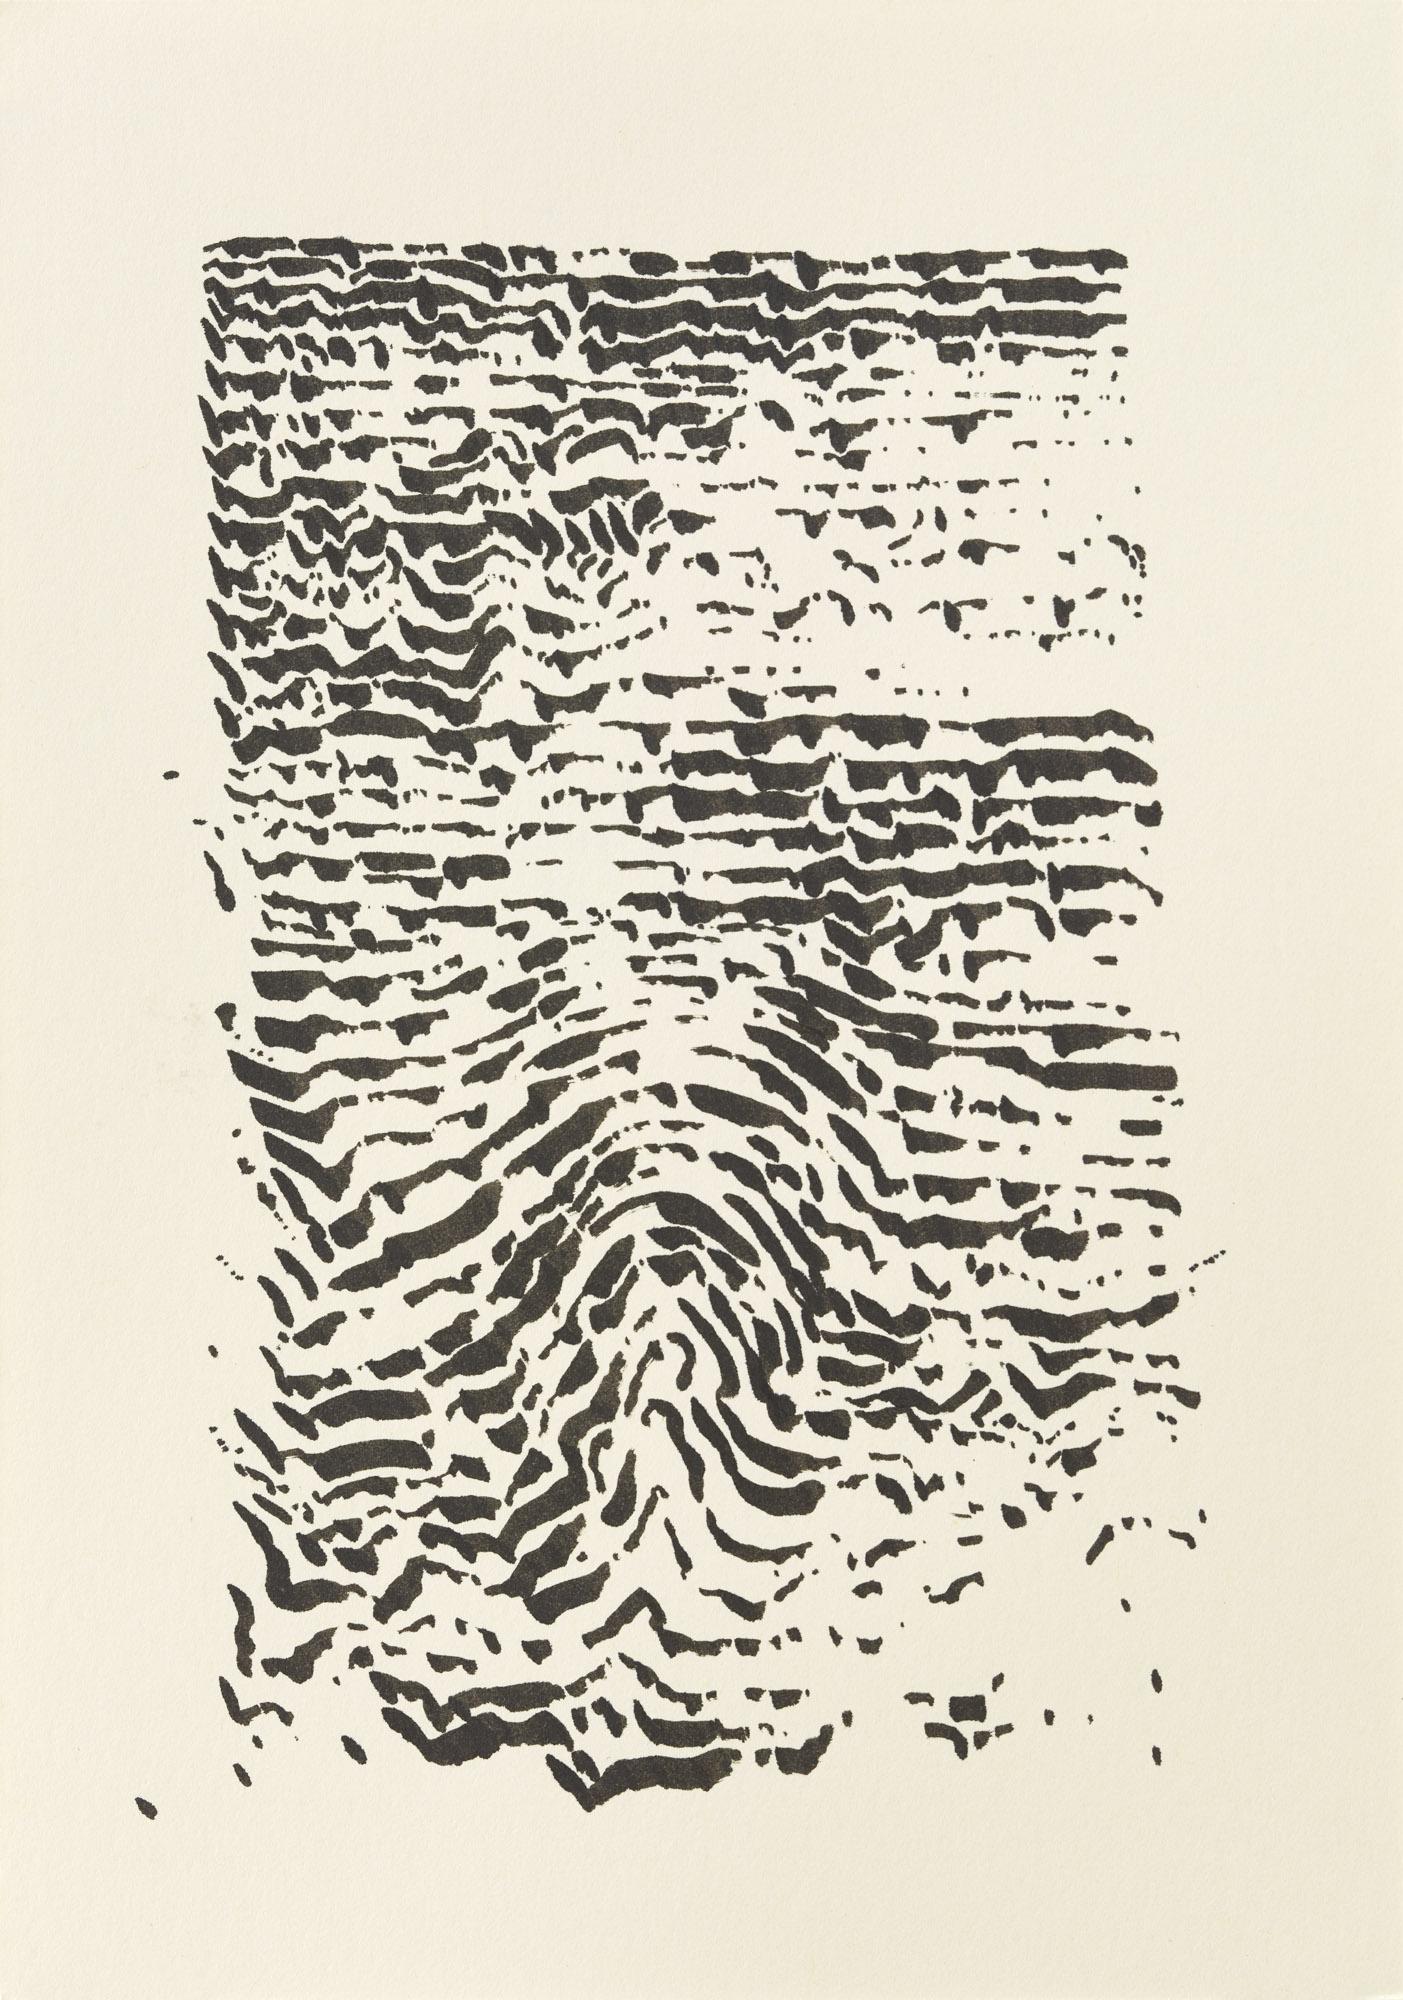 BK P7535 | untitled | ink on paper | 21x15cm | 2015